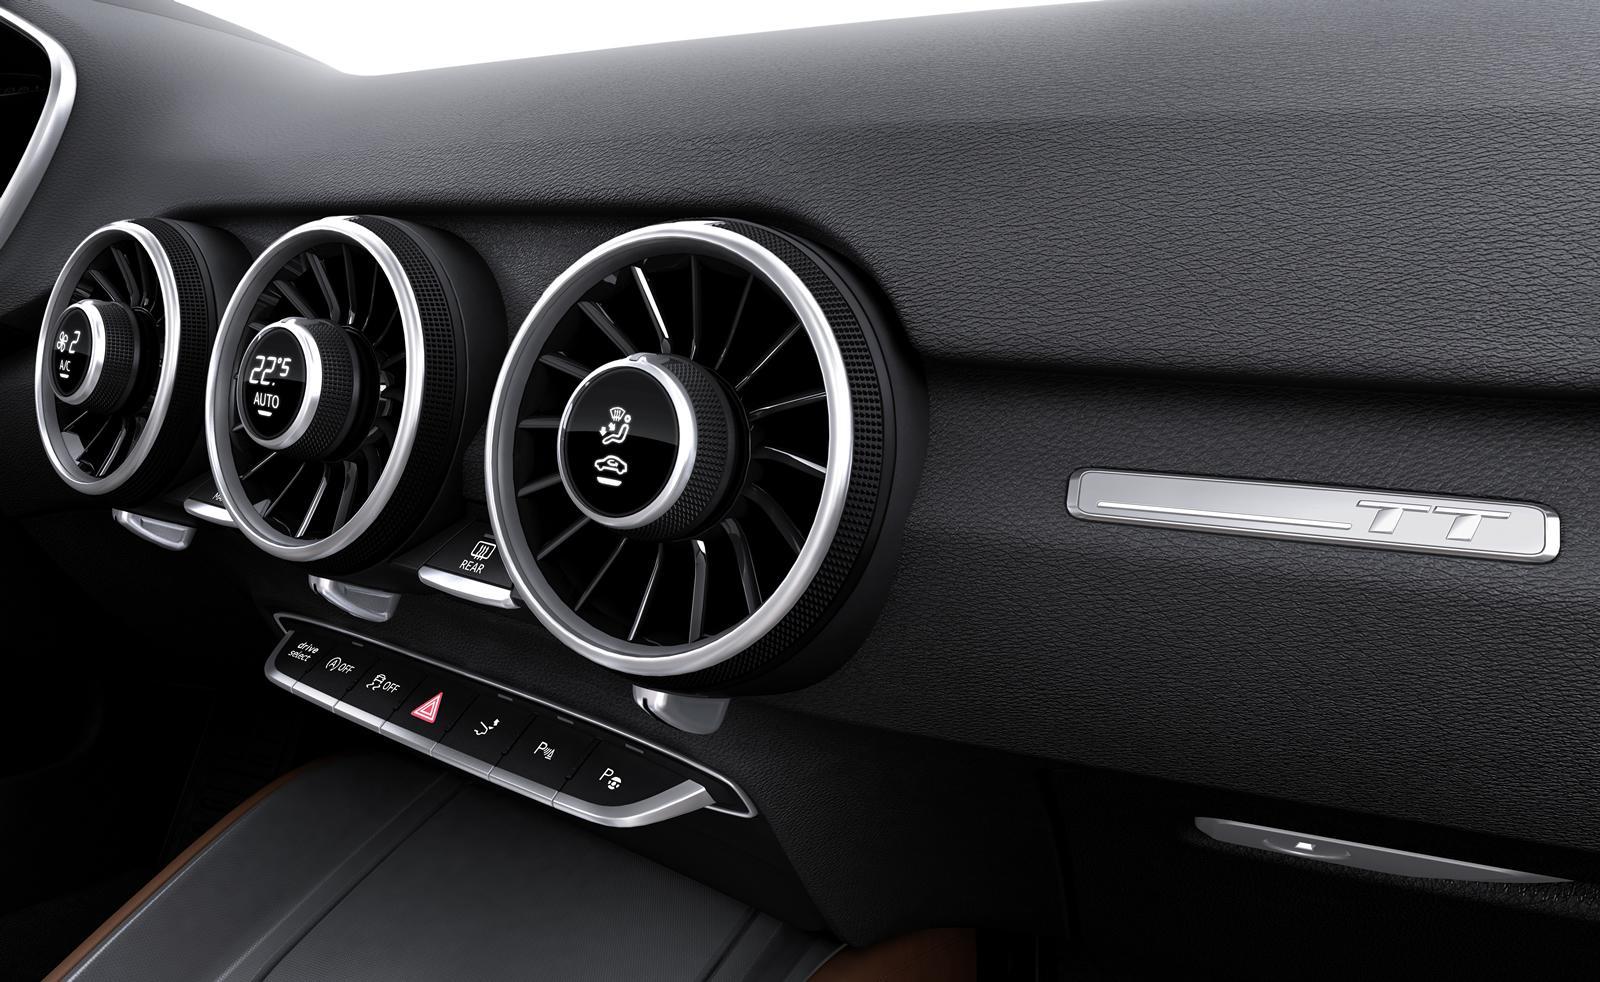 audi 2017 1.2l interior manual air con